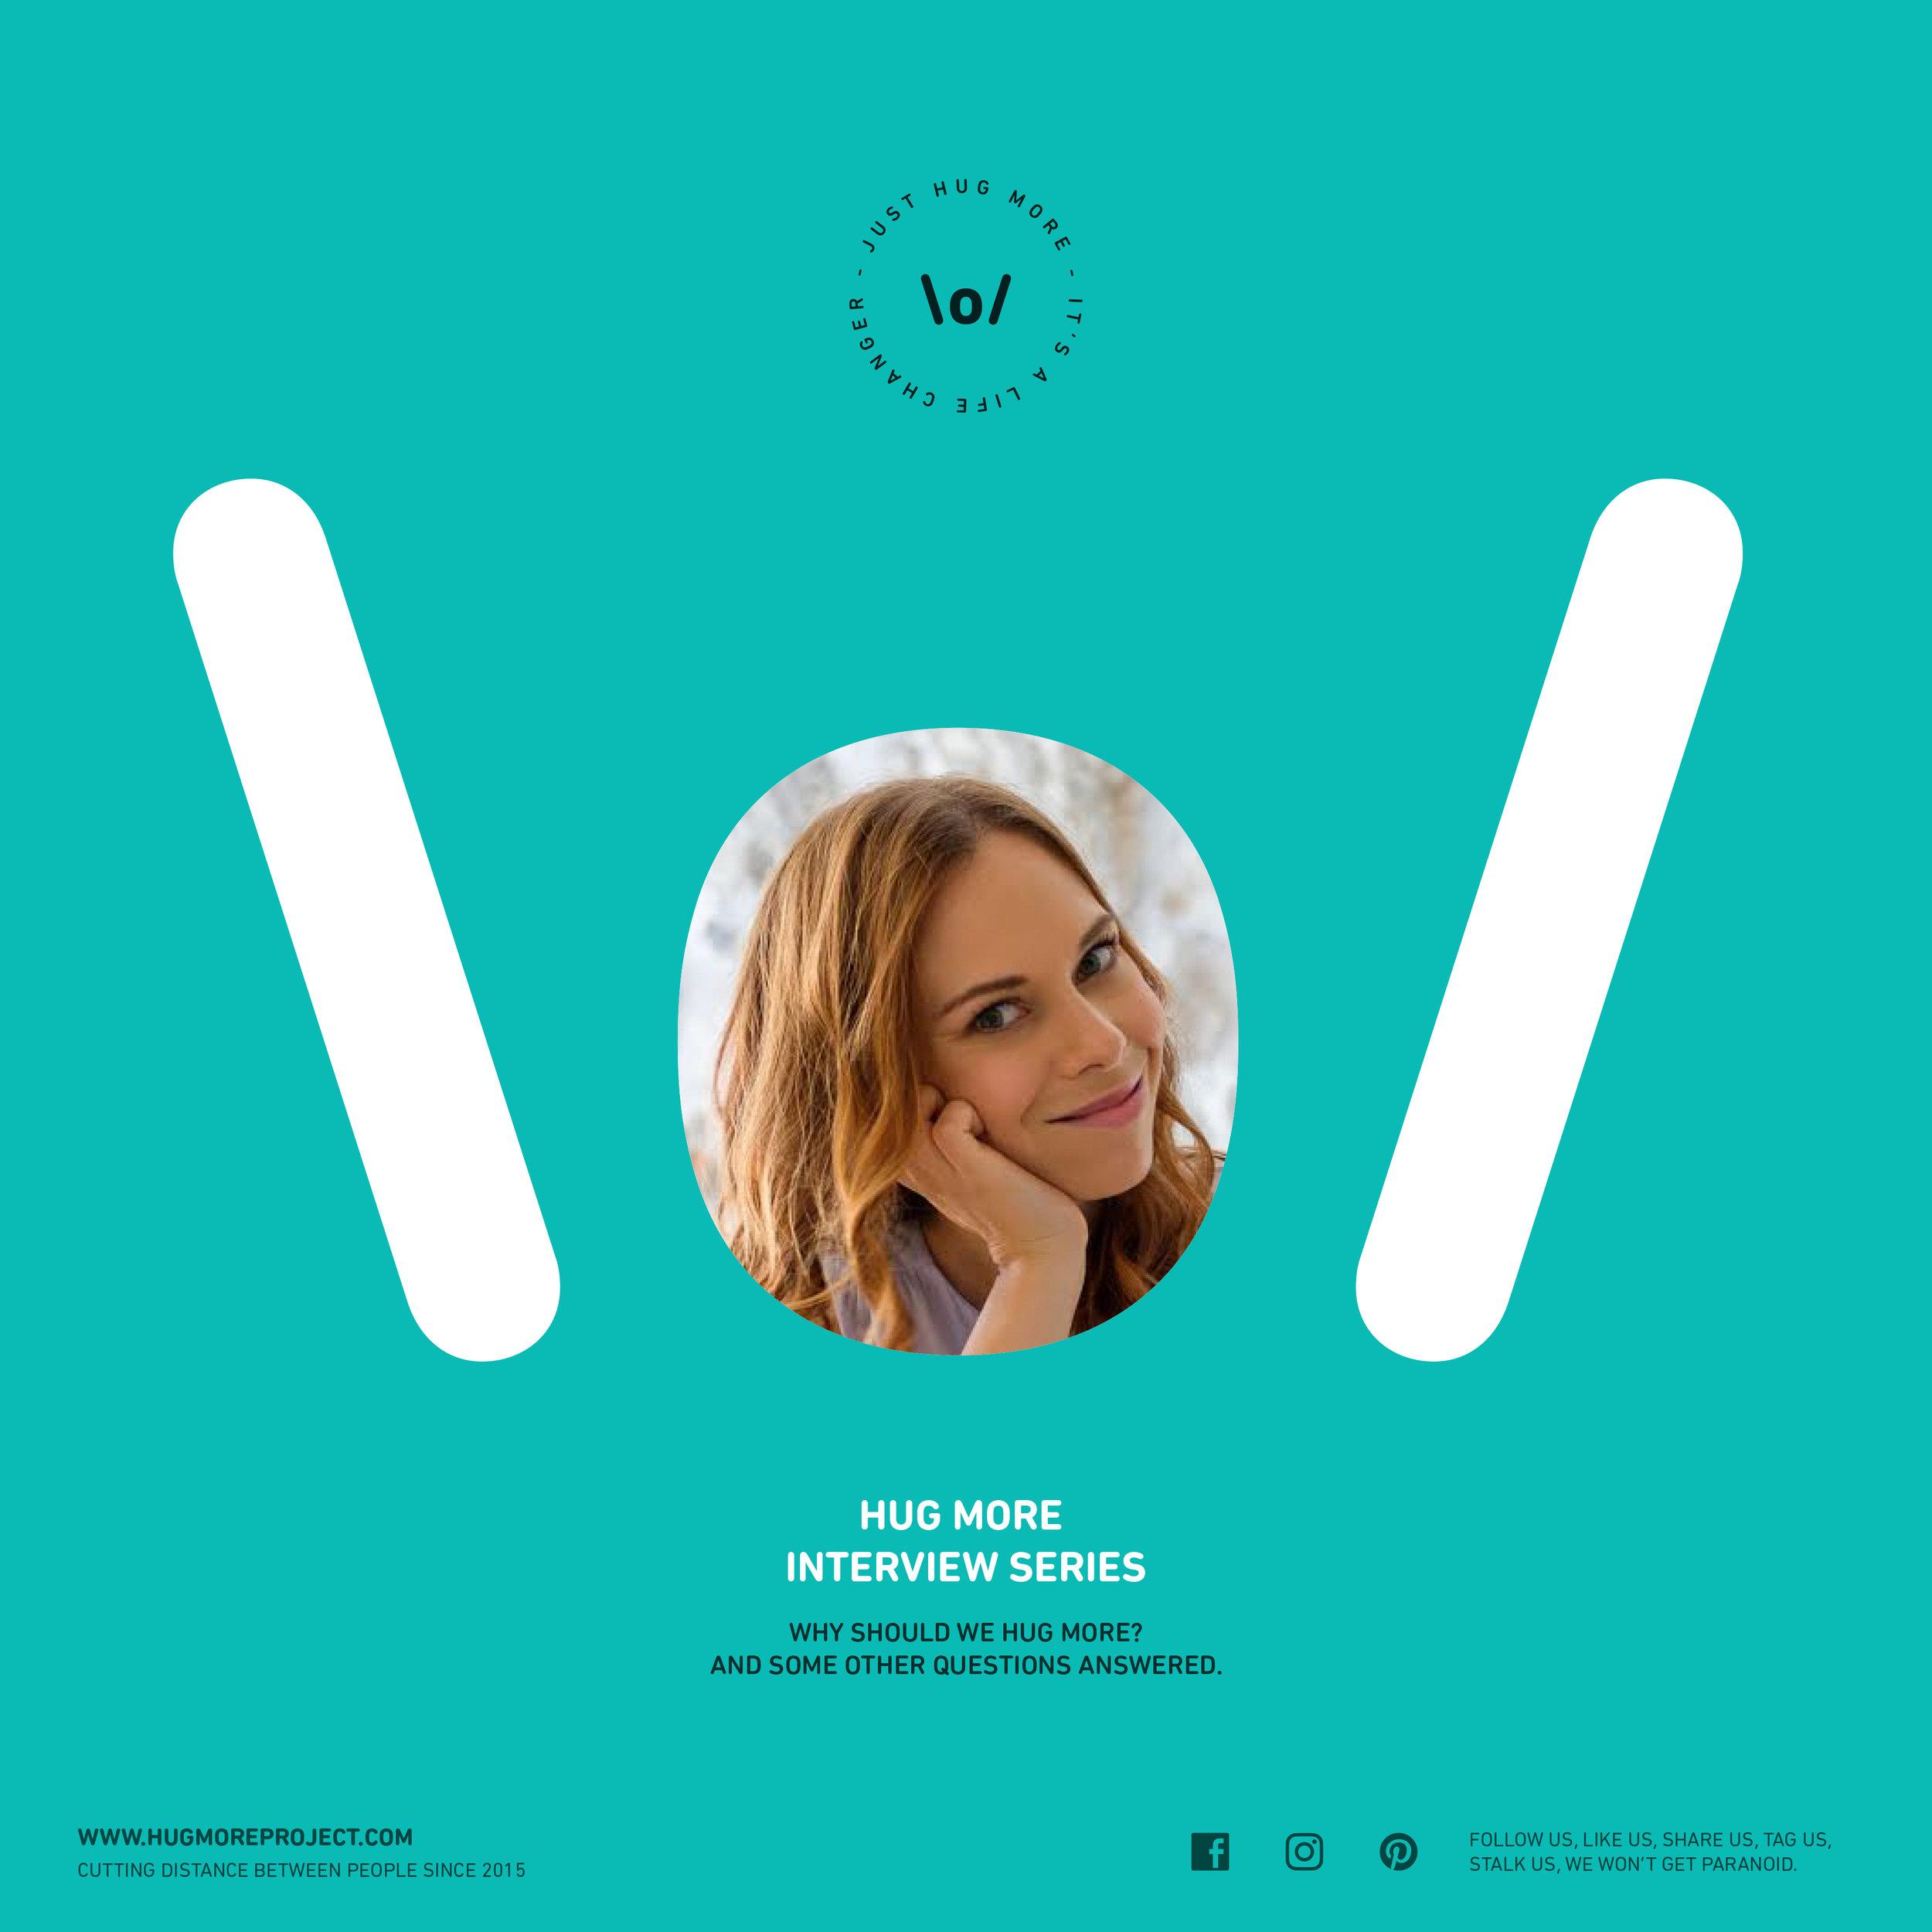 HUG-MORE-interview-020-Jovana_Miljanovic.jpg